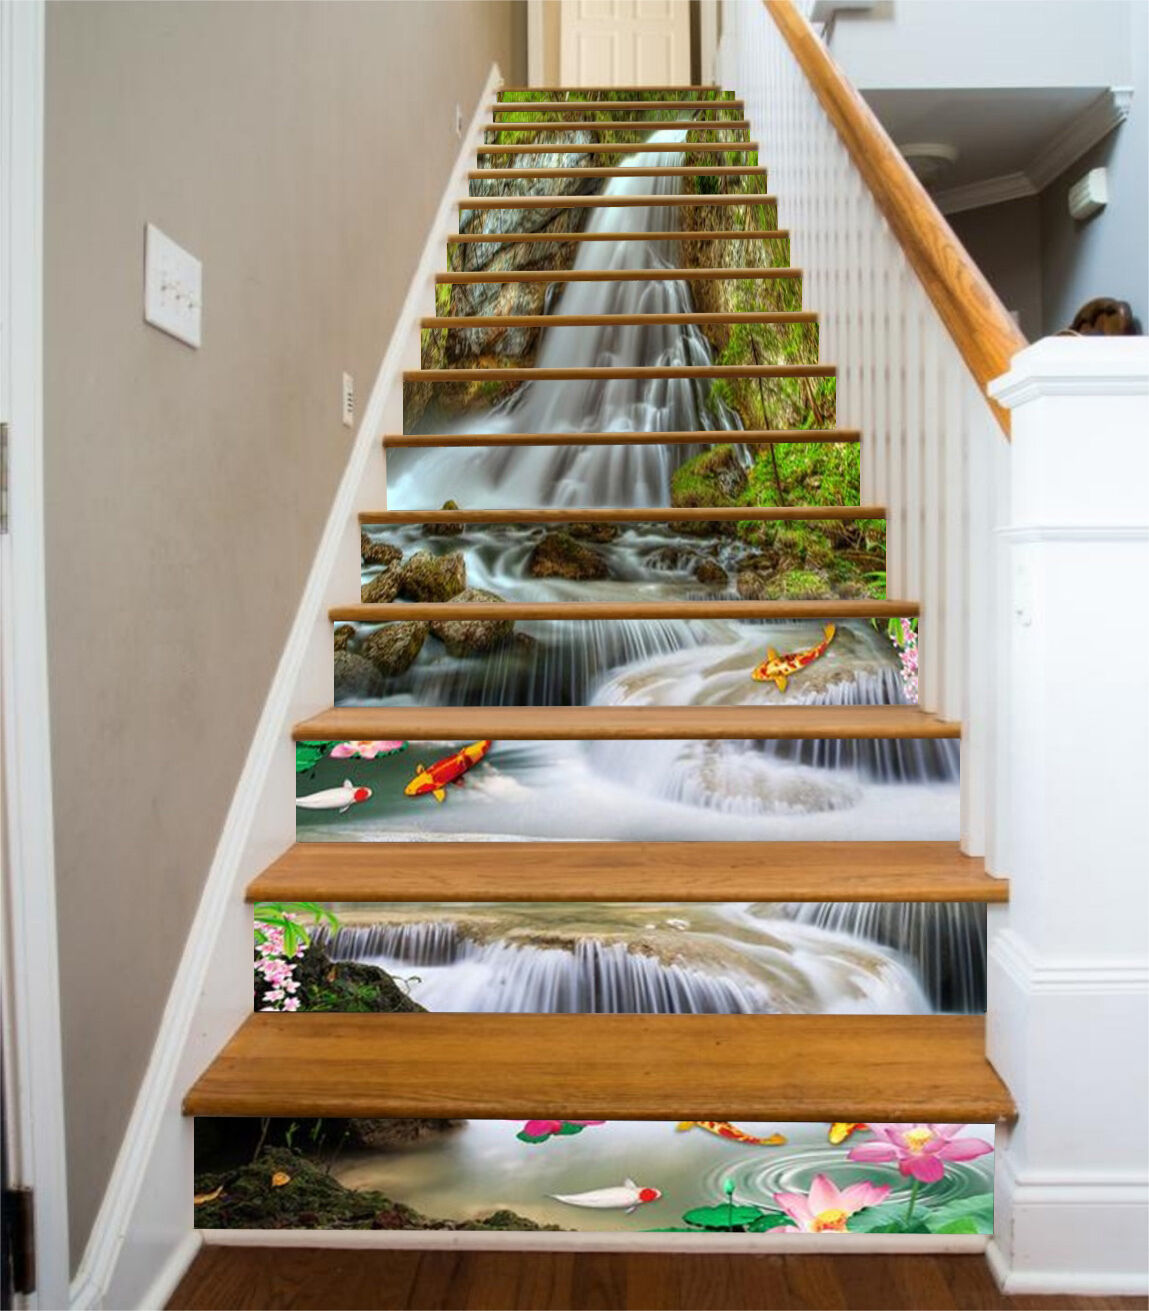 3D Streams, fish 34 Stair Risers Decoration Photo Mural Vinyl Decal Wallpaper US